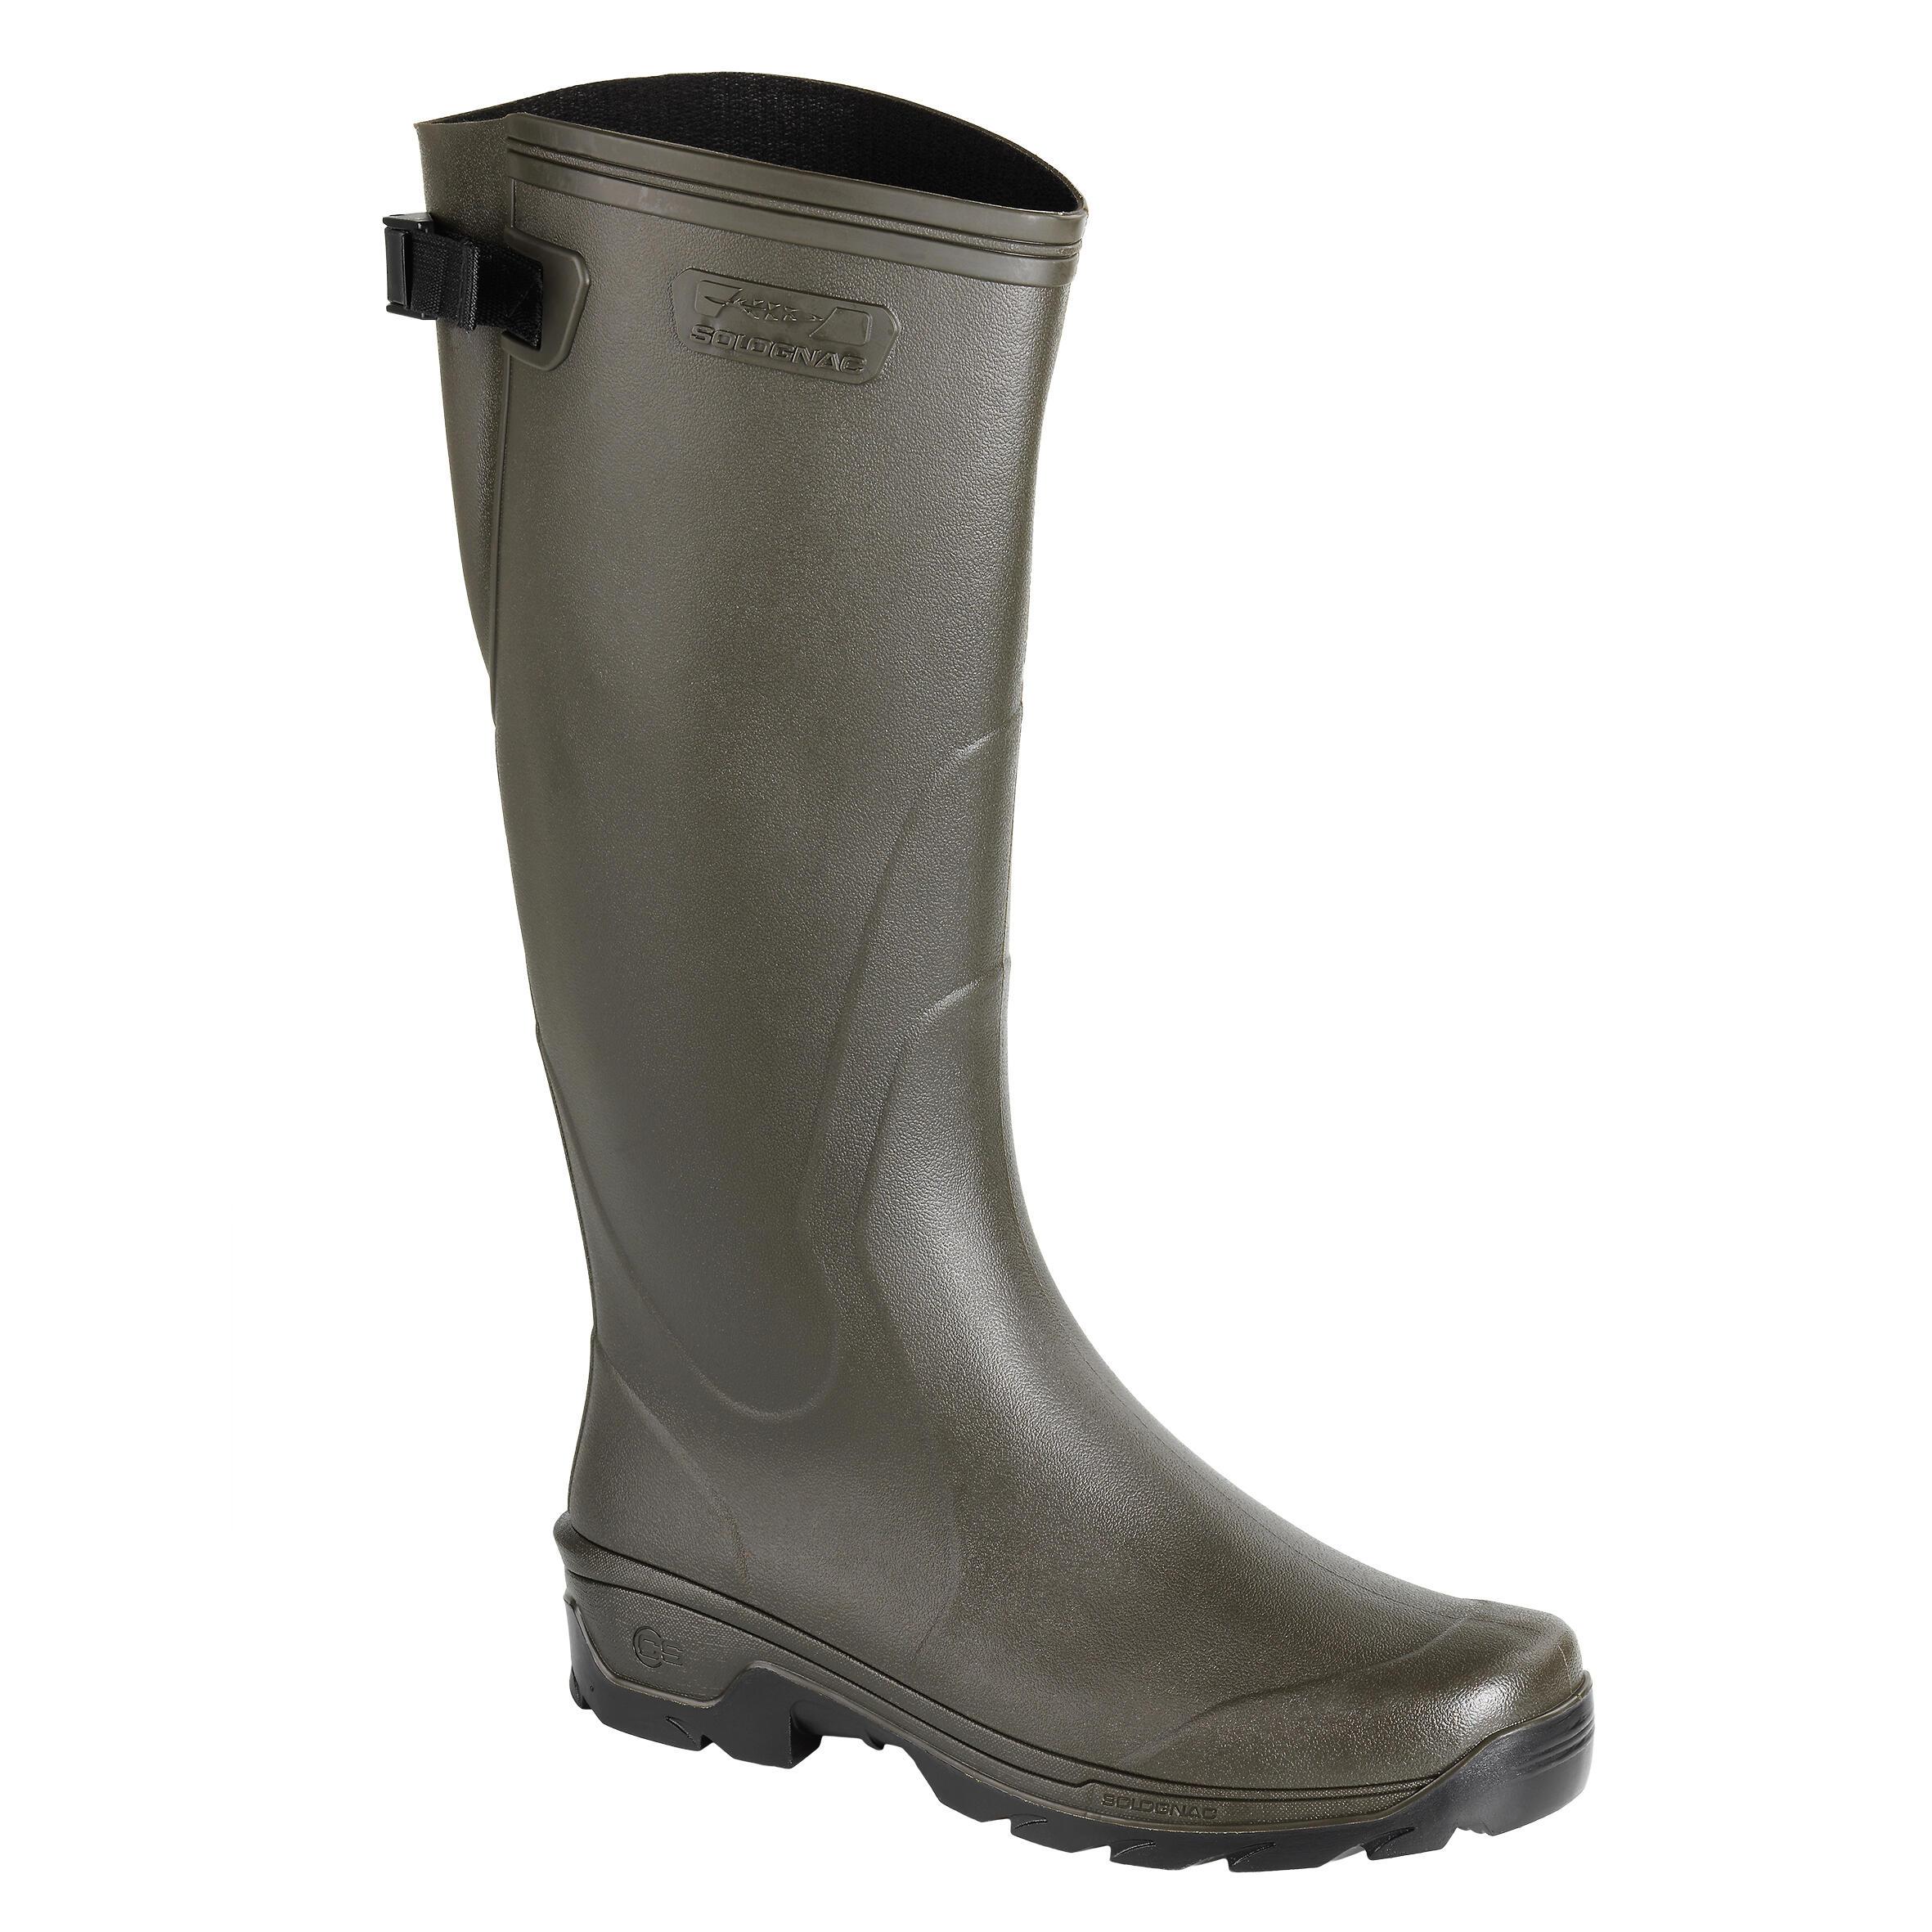 Men's Wellies   Wellington Boots From